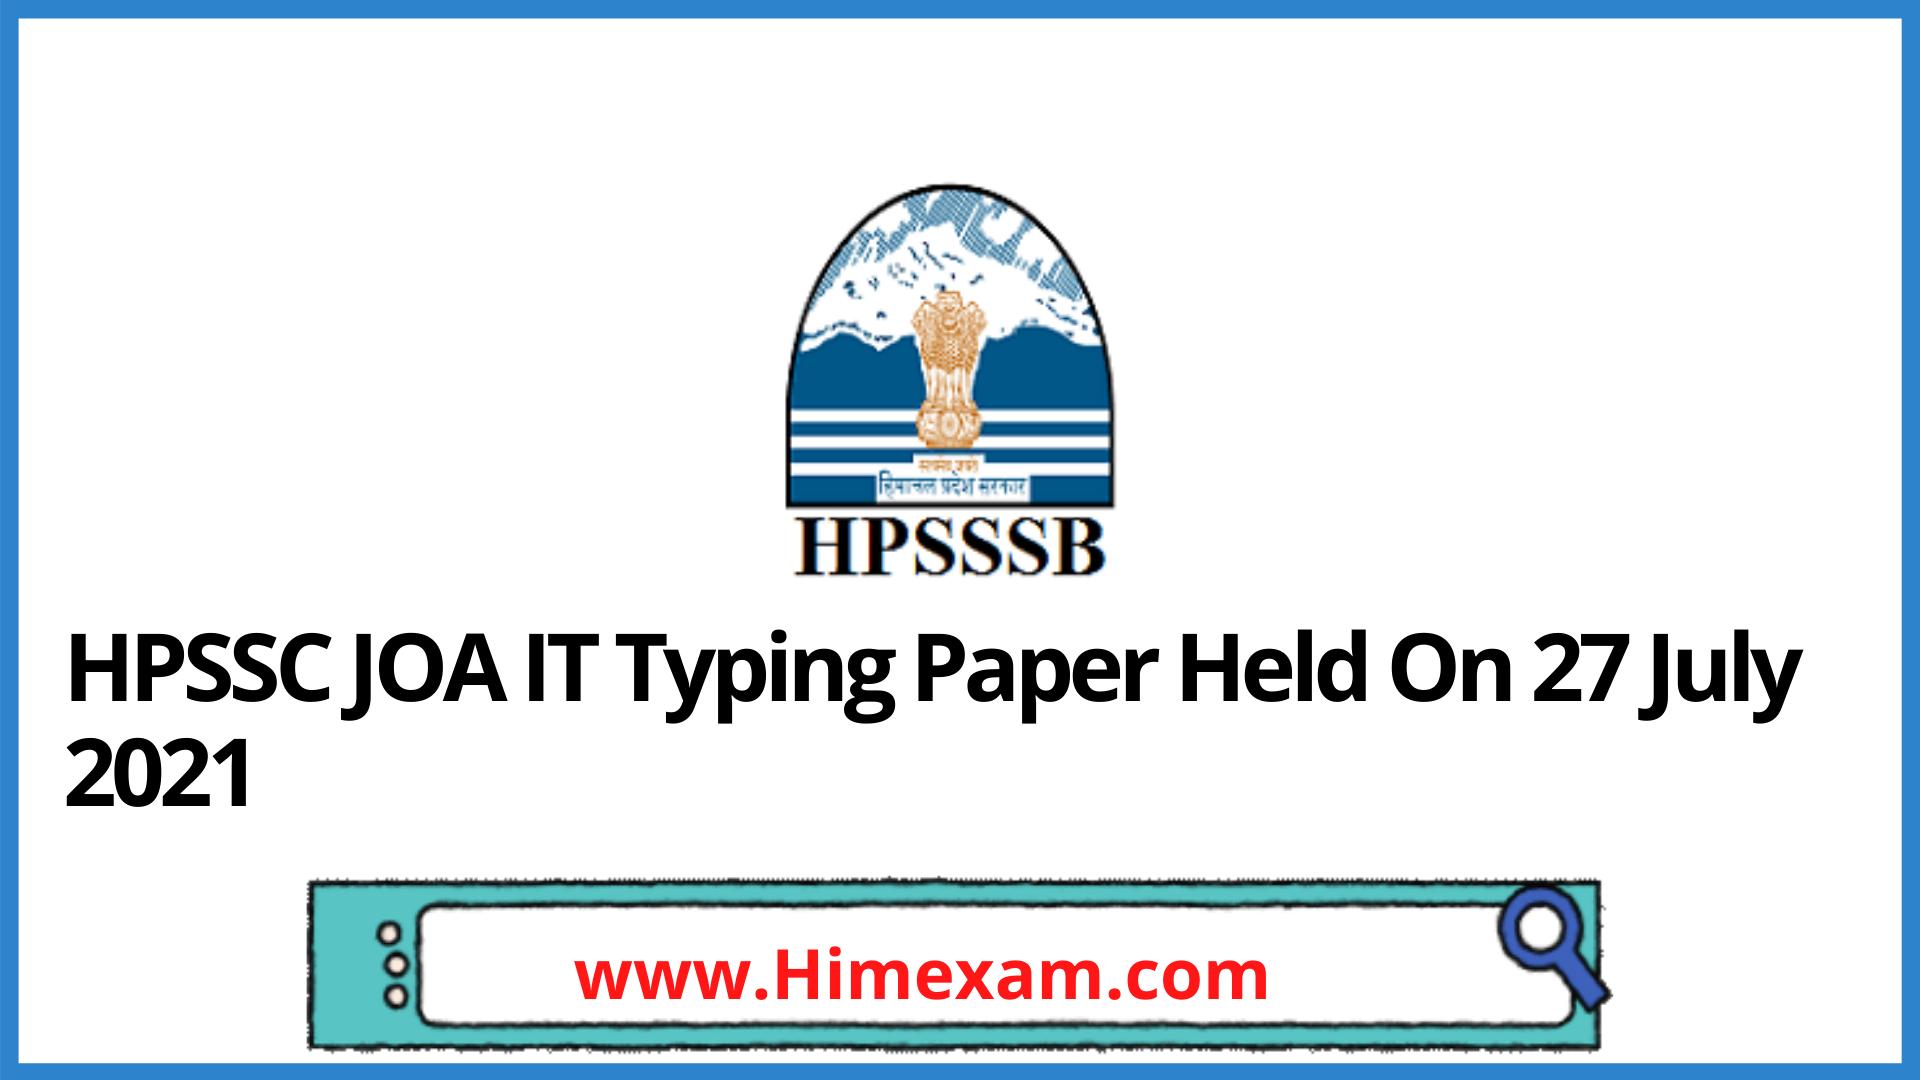 HPSSC JOA IT Typing Paper Held On 27 July 2021